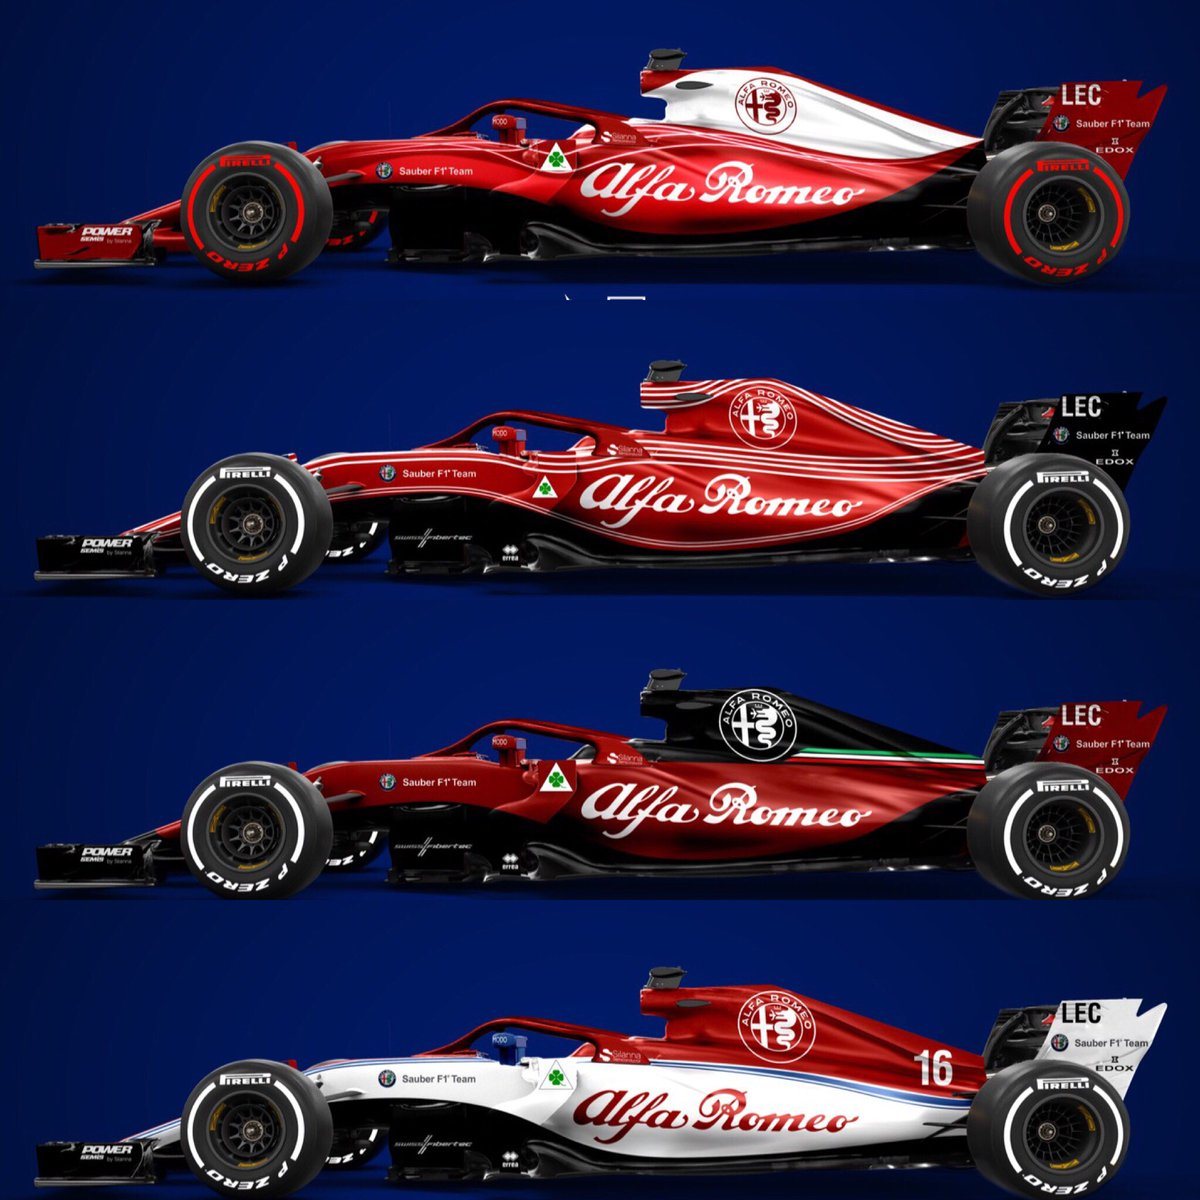 Sean Bull Design On Twitter 8 Alfa Romeo Sauberf1team Concept Liveries For Drivetribe What S Your Favourite Sauber Alfaromeo F1 Livery F12018 Leclerc Ericsson Https T Co H6ir66w4m5